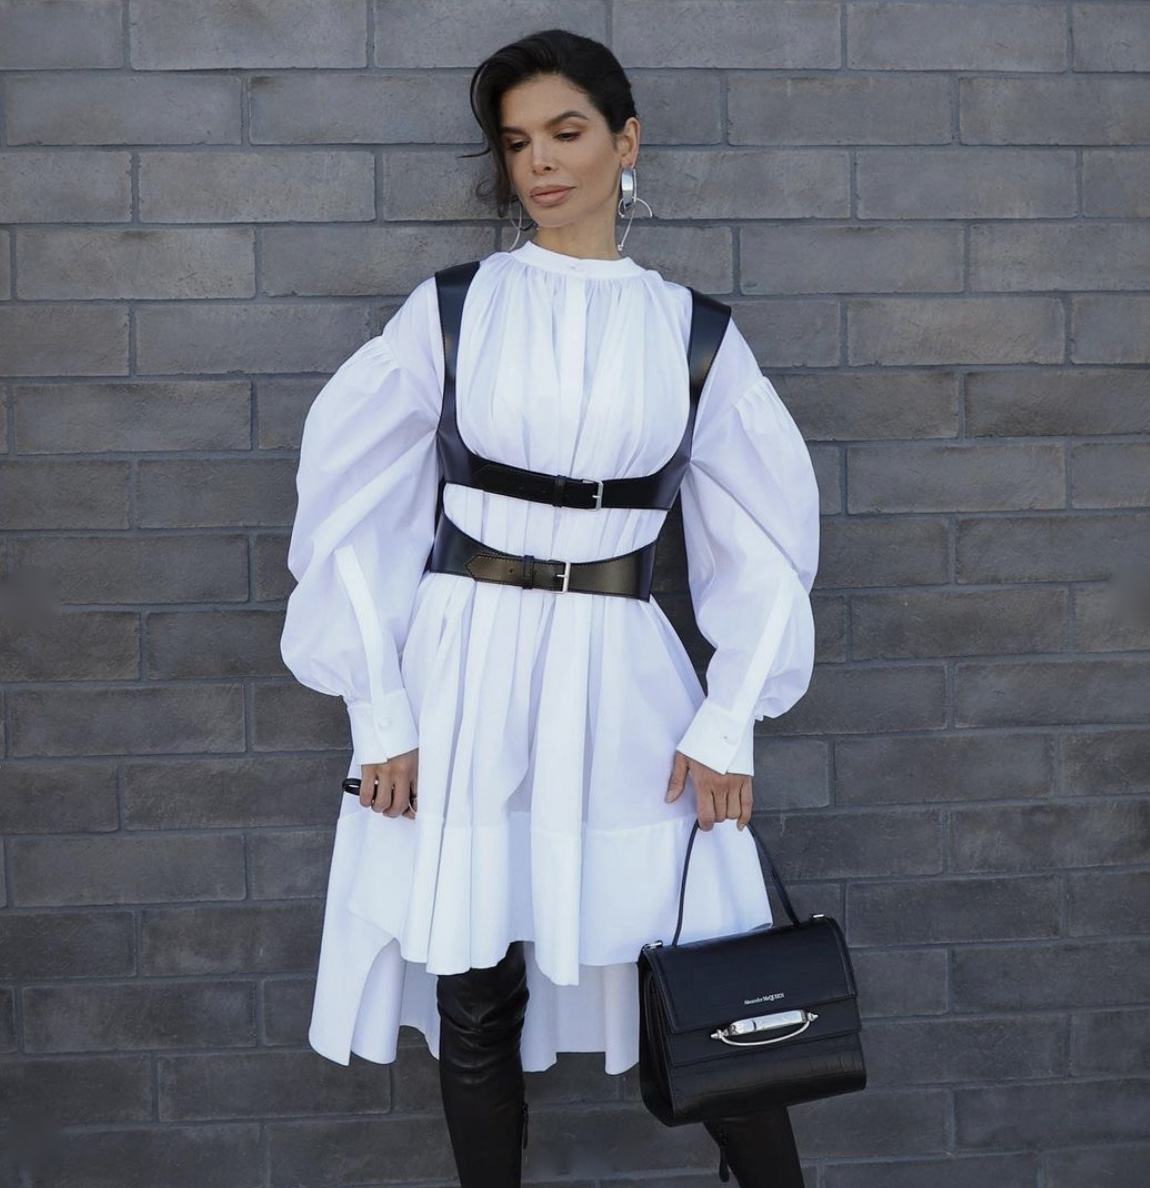 white shirt dress black harness puffy sleeves stylerave